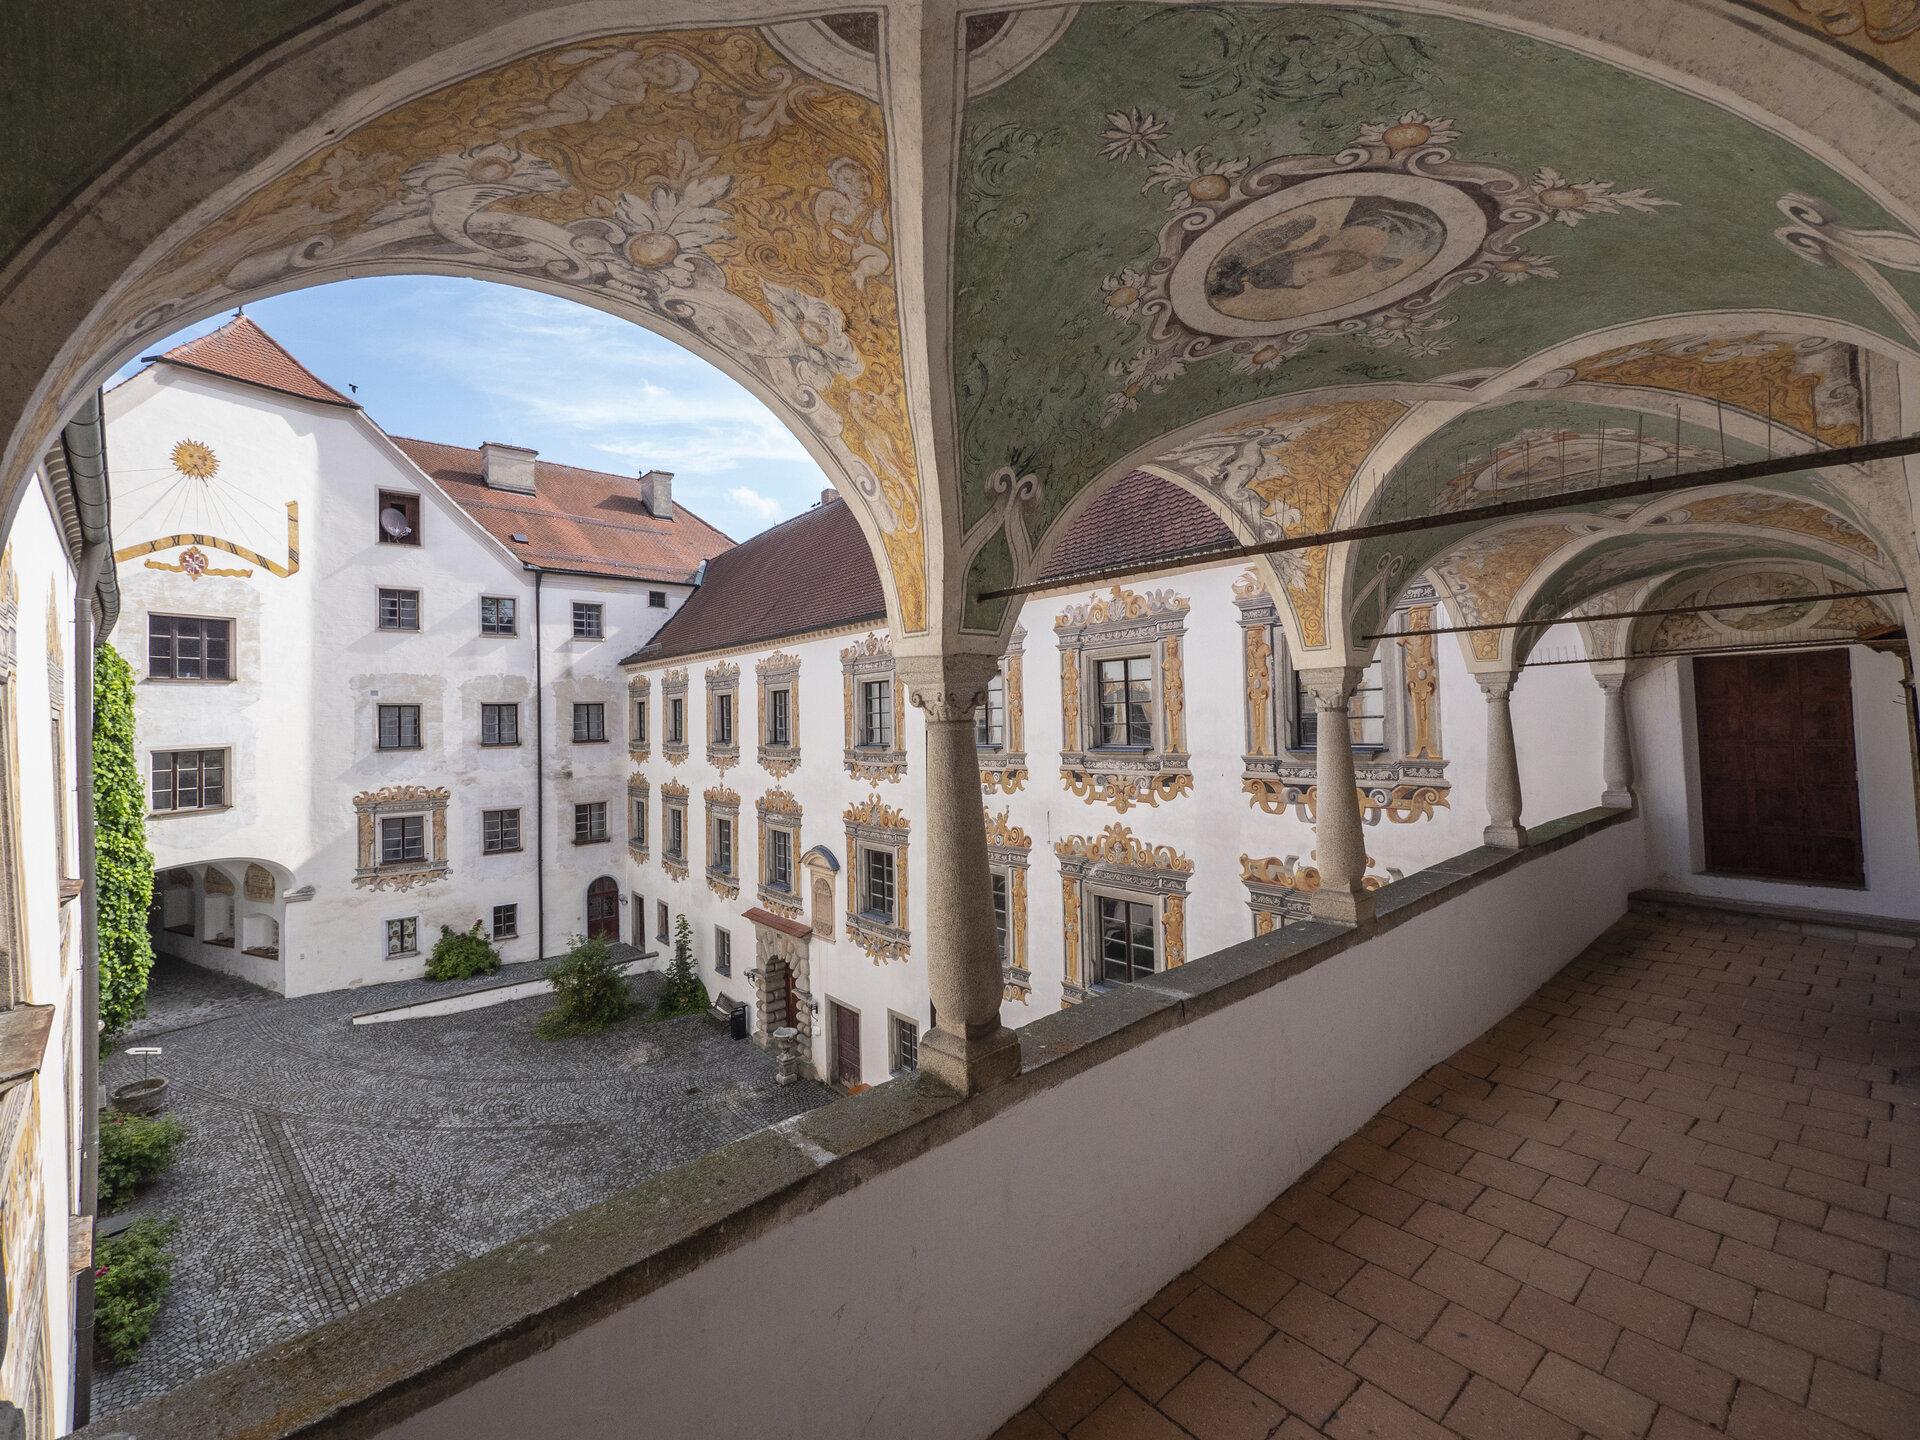 Sektempfang Innenhof